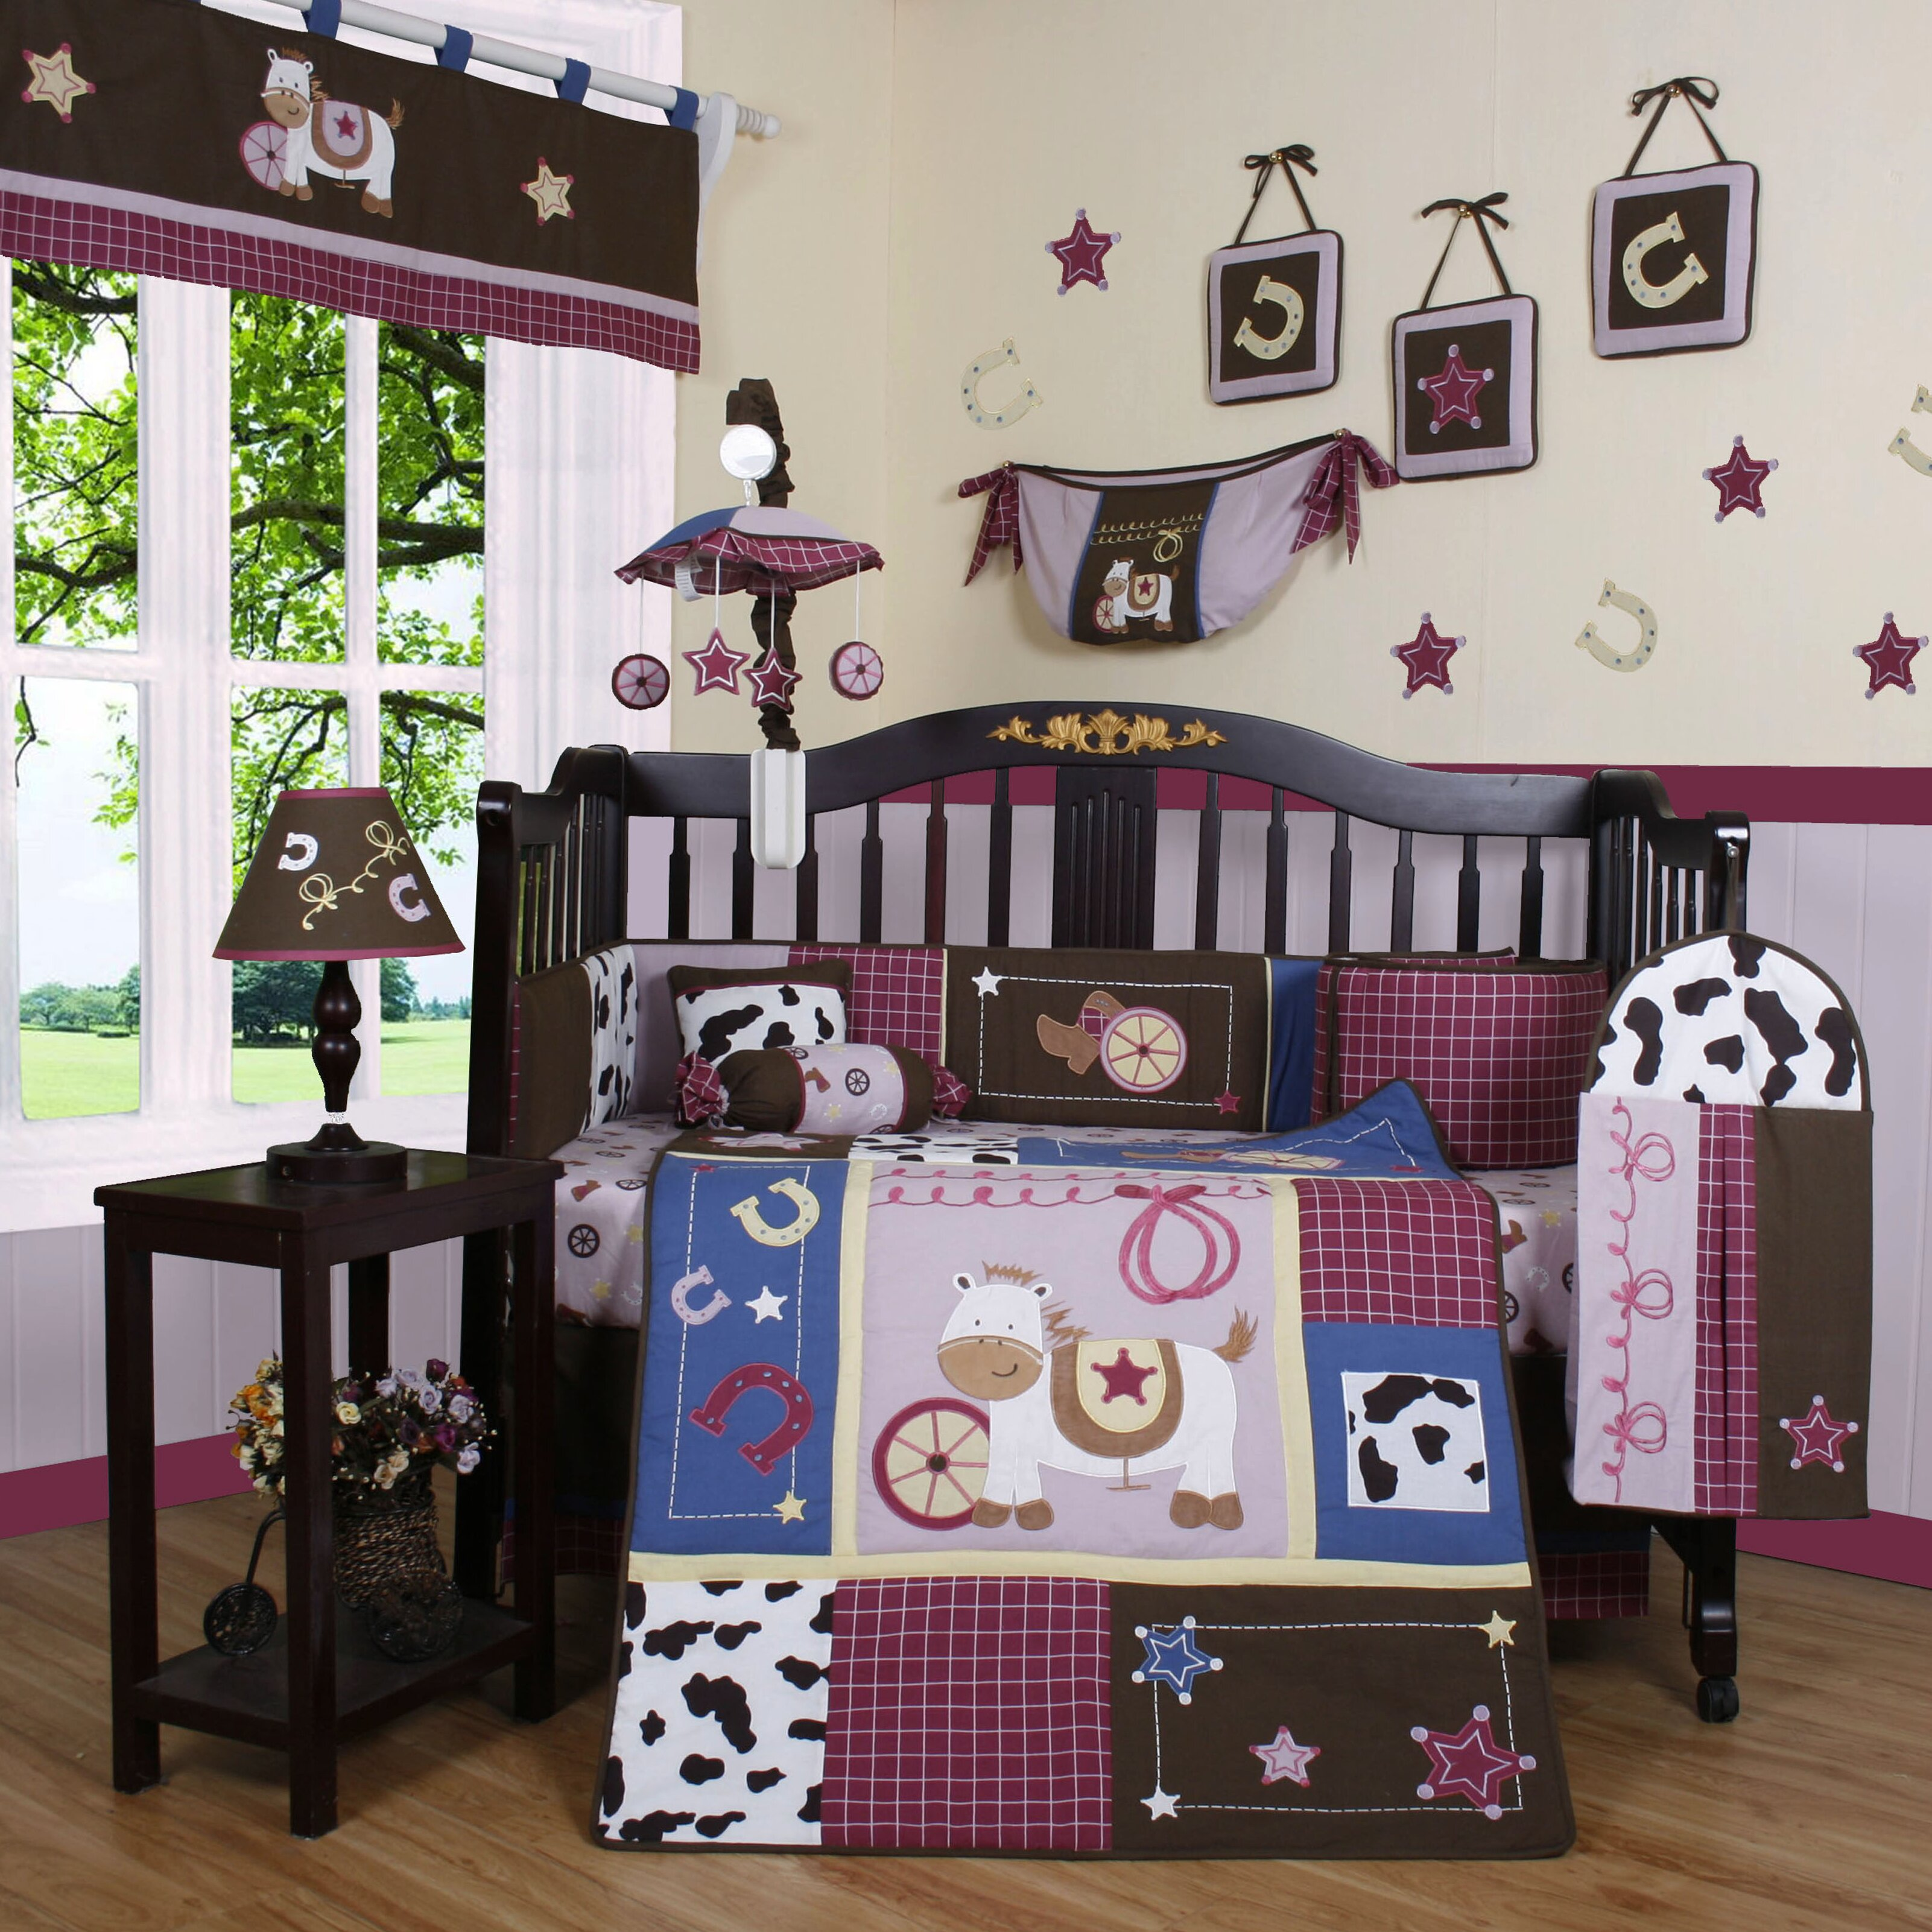 Geenny boutique western 13 piece crib bedding set reviews wayfair - Geenny crib bedding sets ...